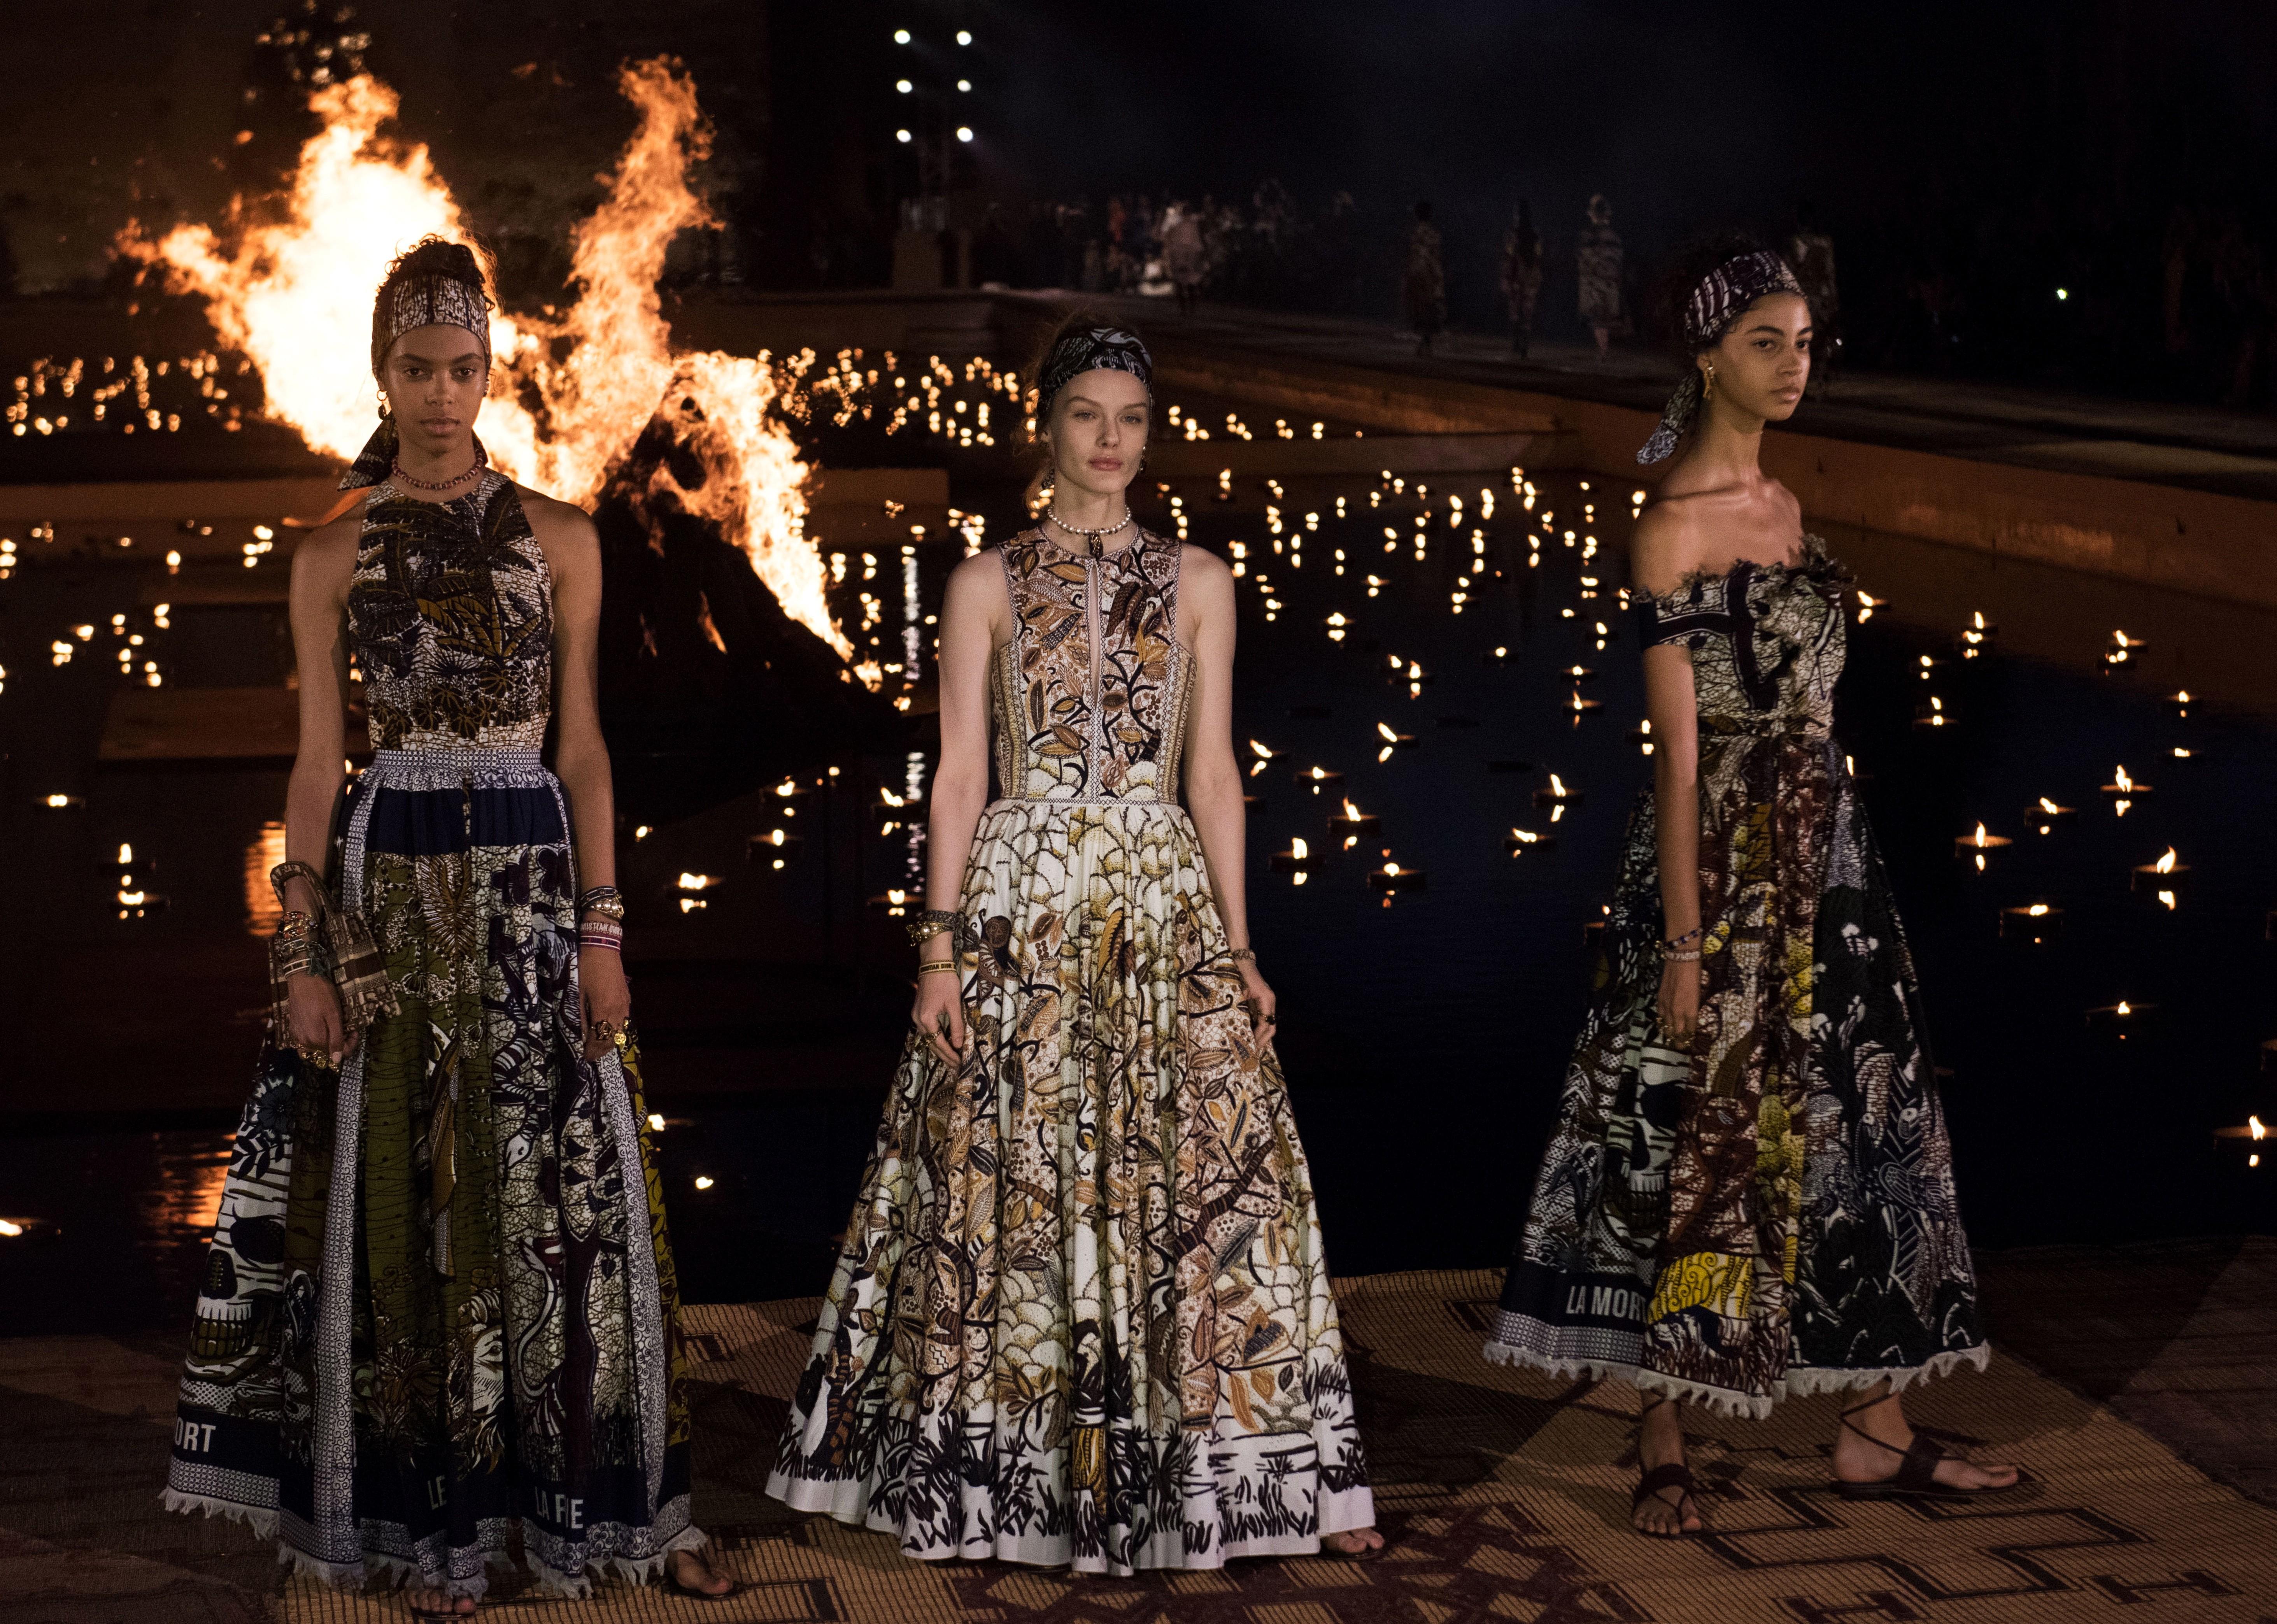 09939ba6d36 Stars Lupita Nyong'o and Jessica Alba shine as Dior's Cruise show lights up  Marrakech's night sky